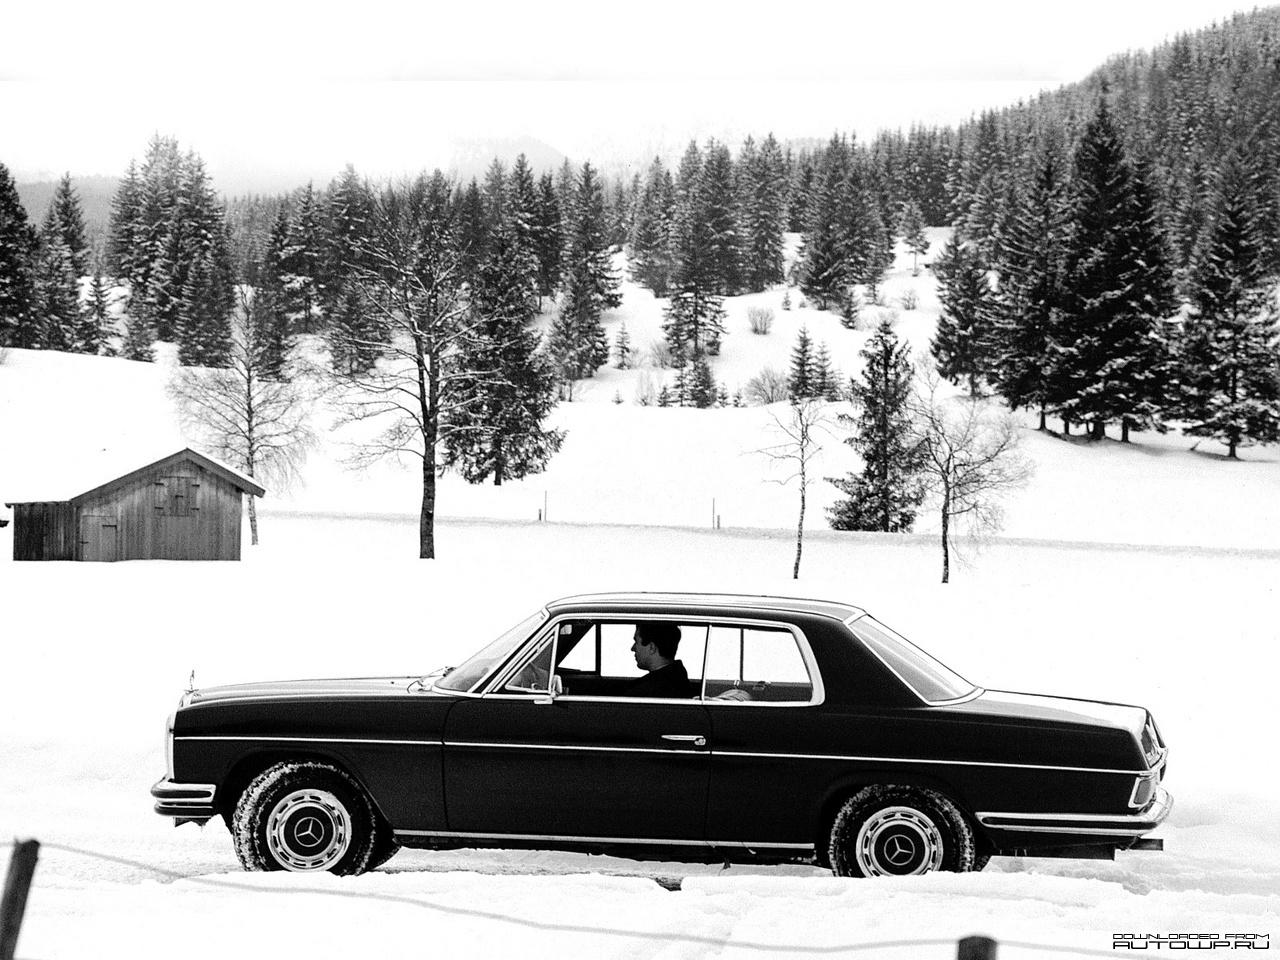 Mercedes Benz W114 W115 Navigation Menu Engine Diagrams Series 114 115